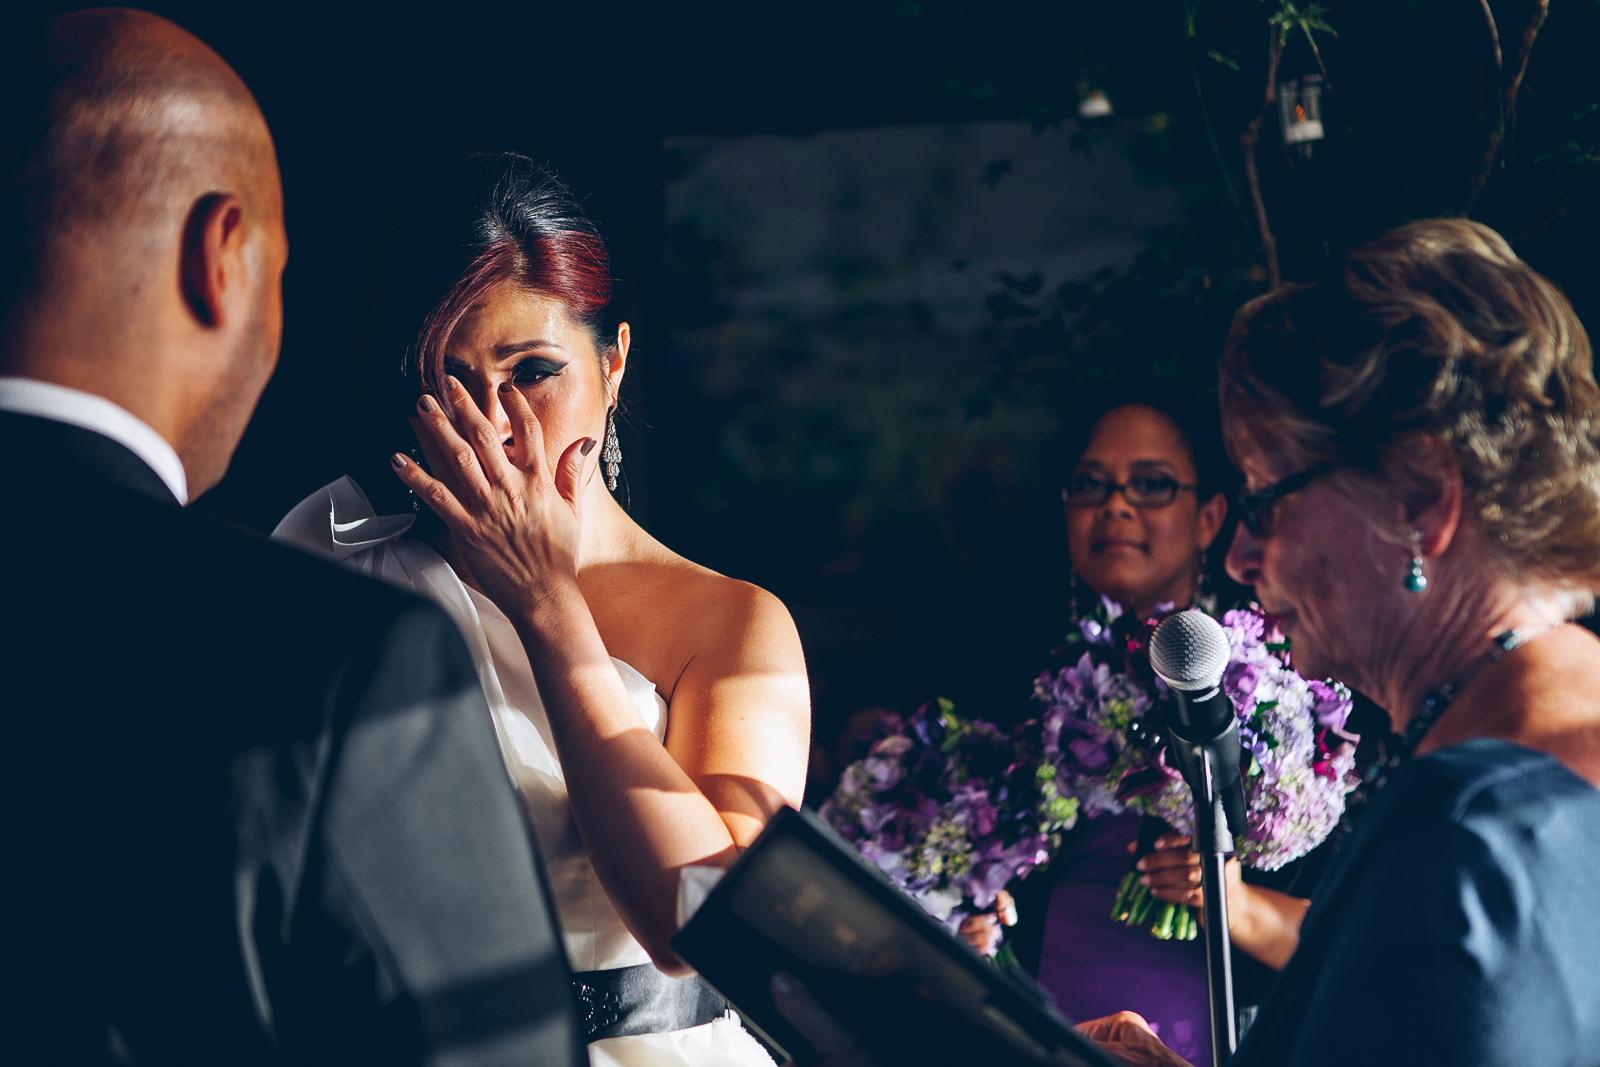 greens_restaurant_wedding_photography_san_franscisco_ebony_siovhan_bokeh_photography_41.jpg